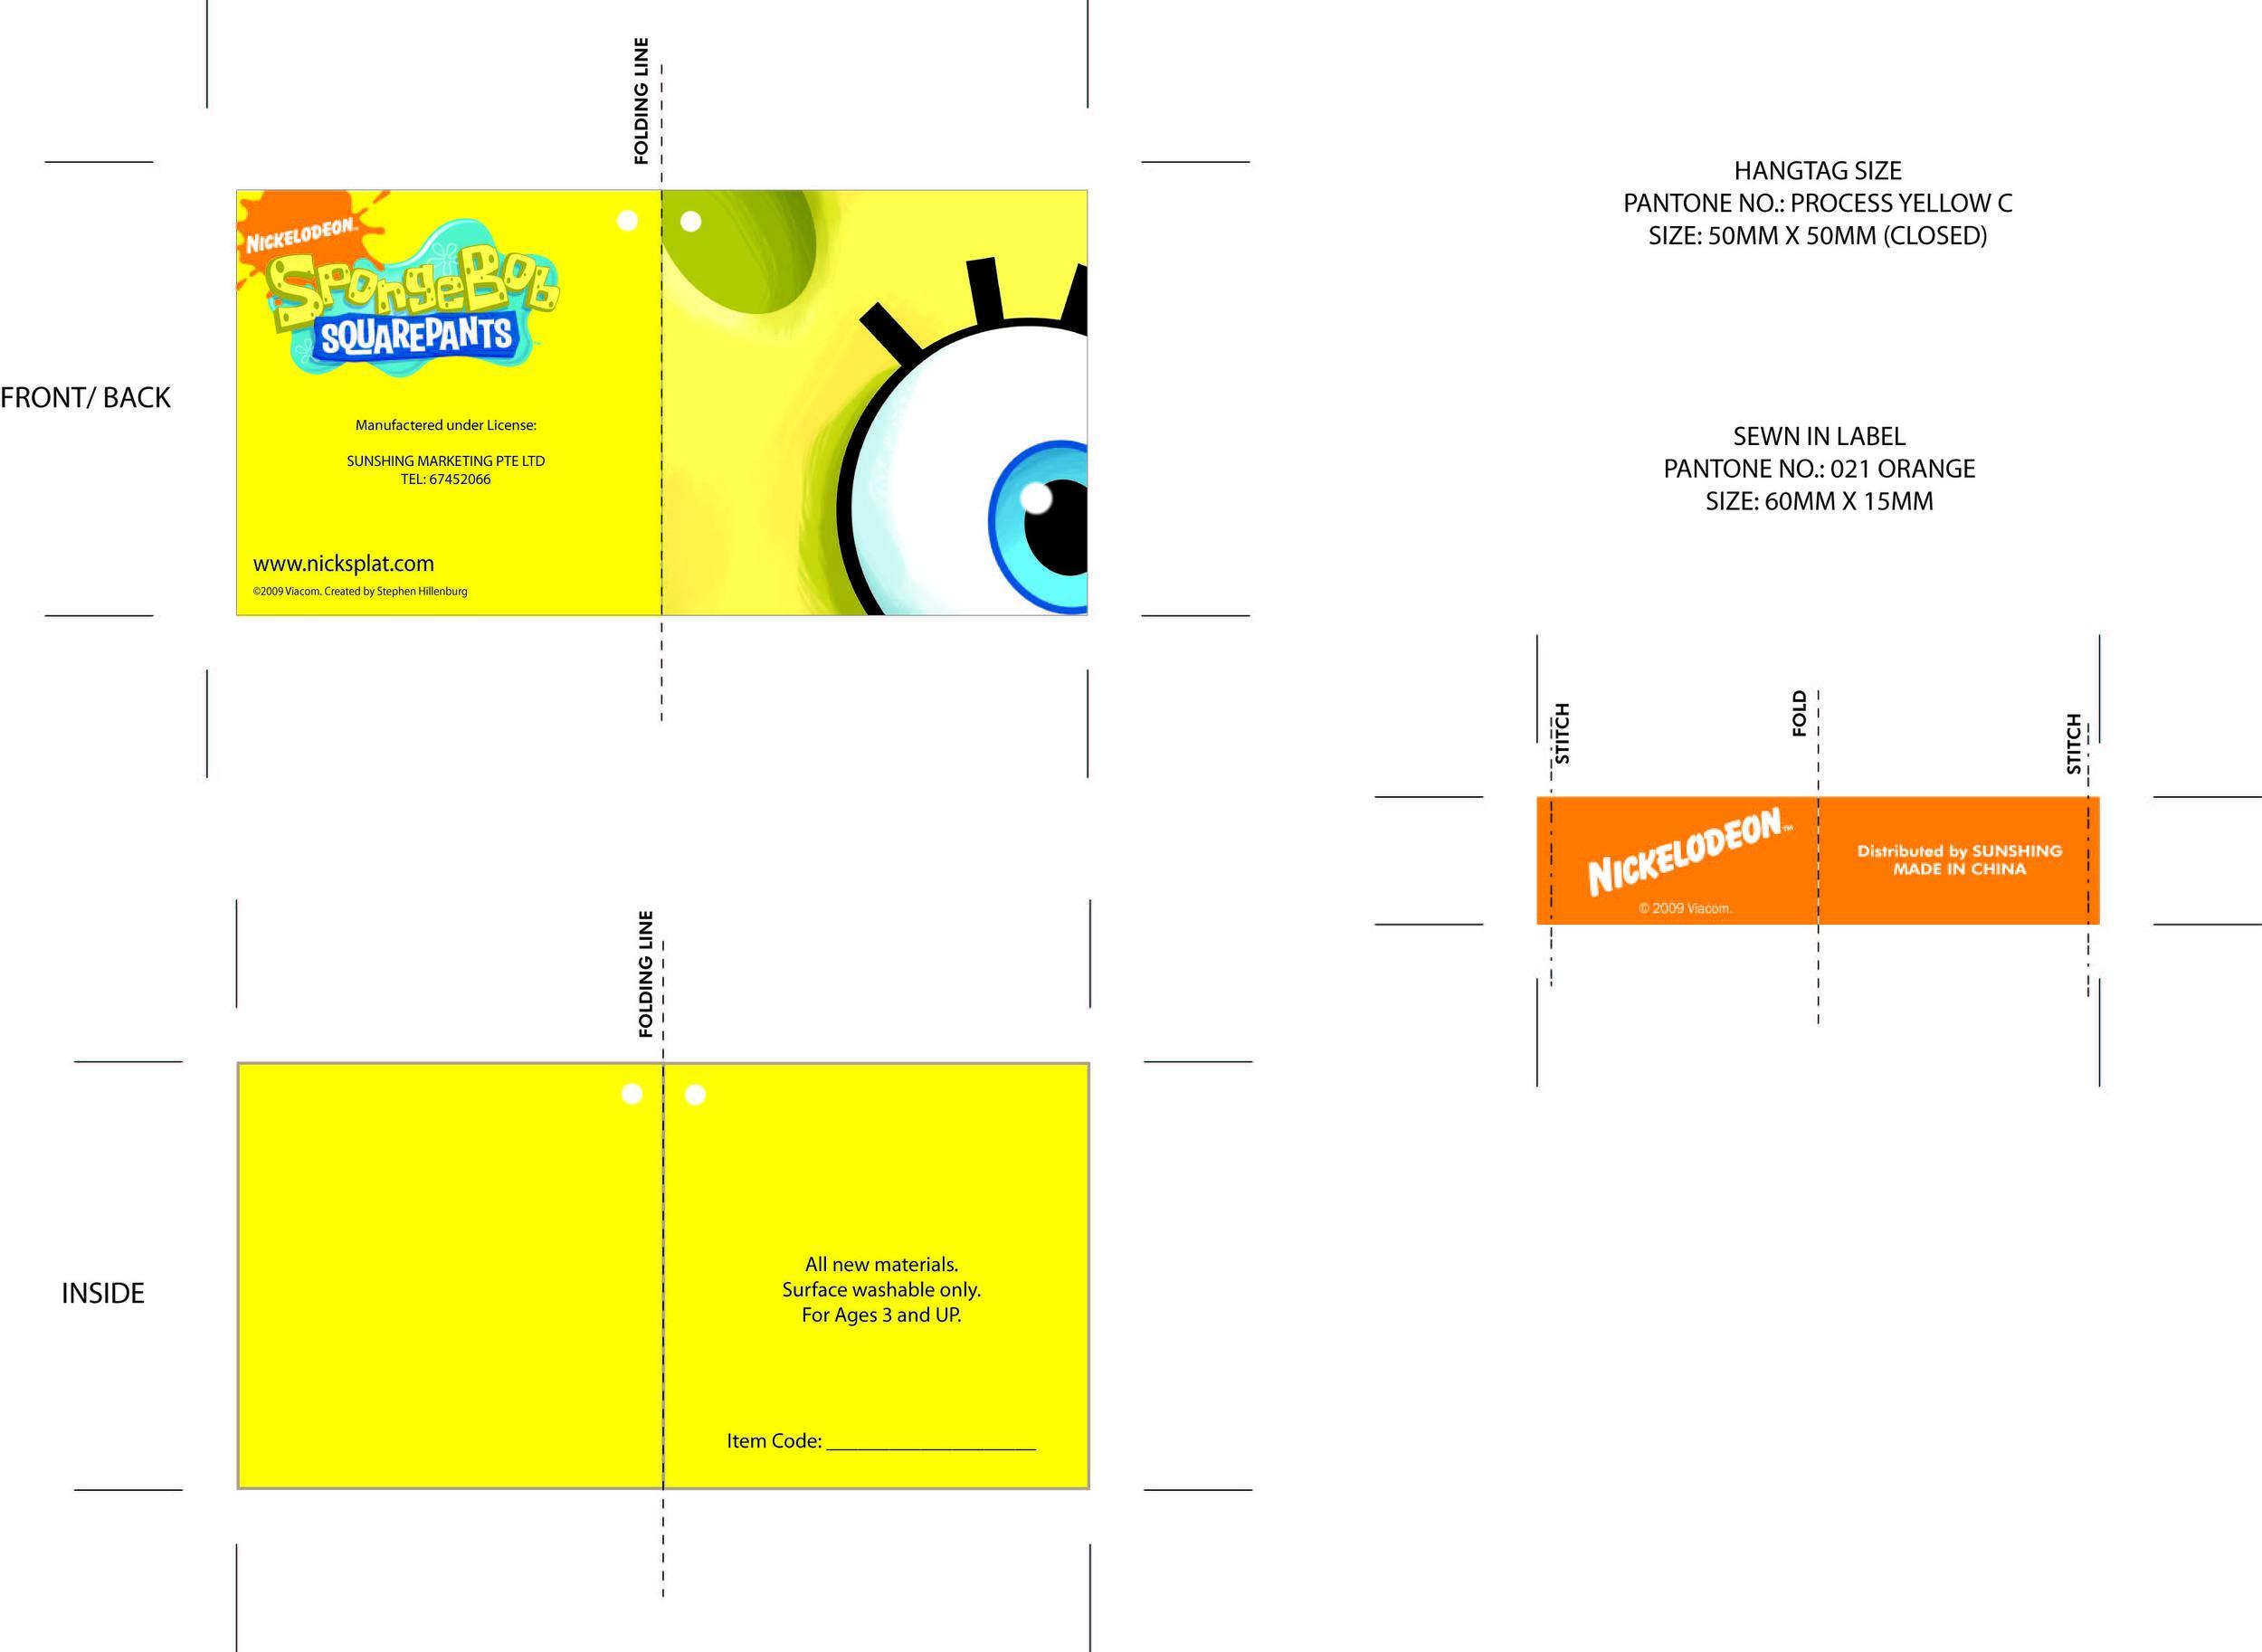 spongebob hangtag & SIL.jpg